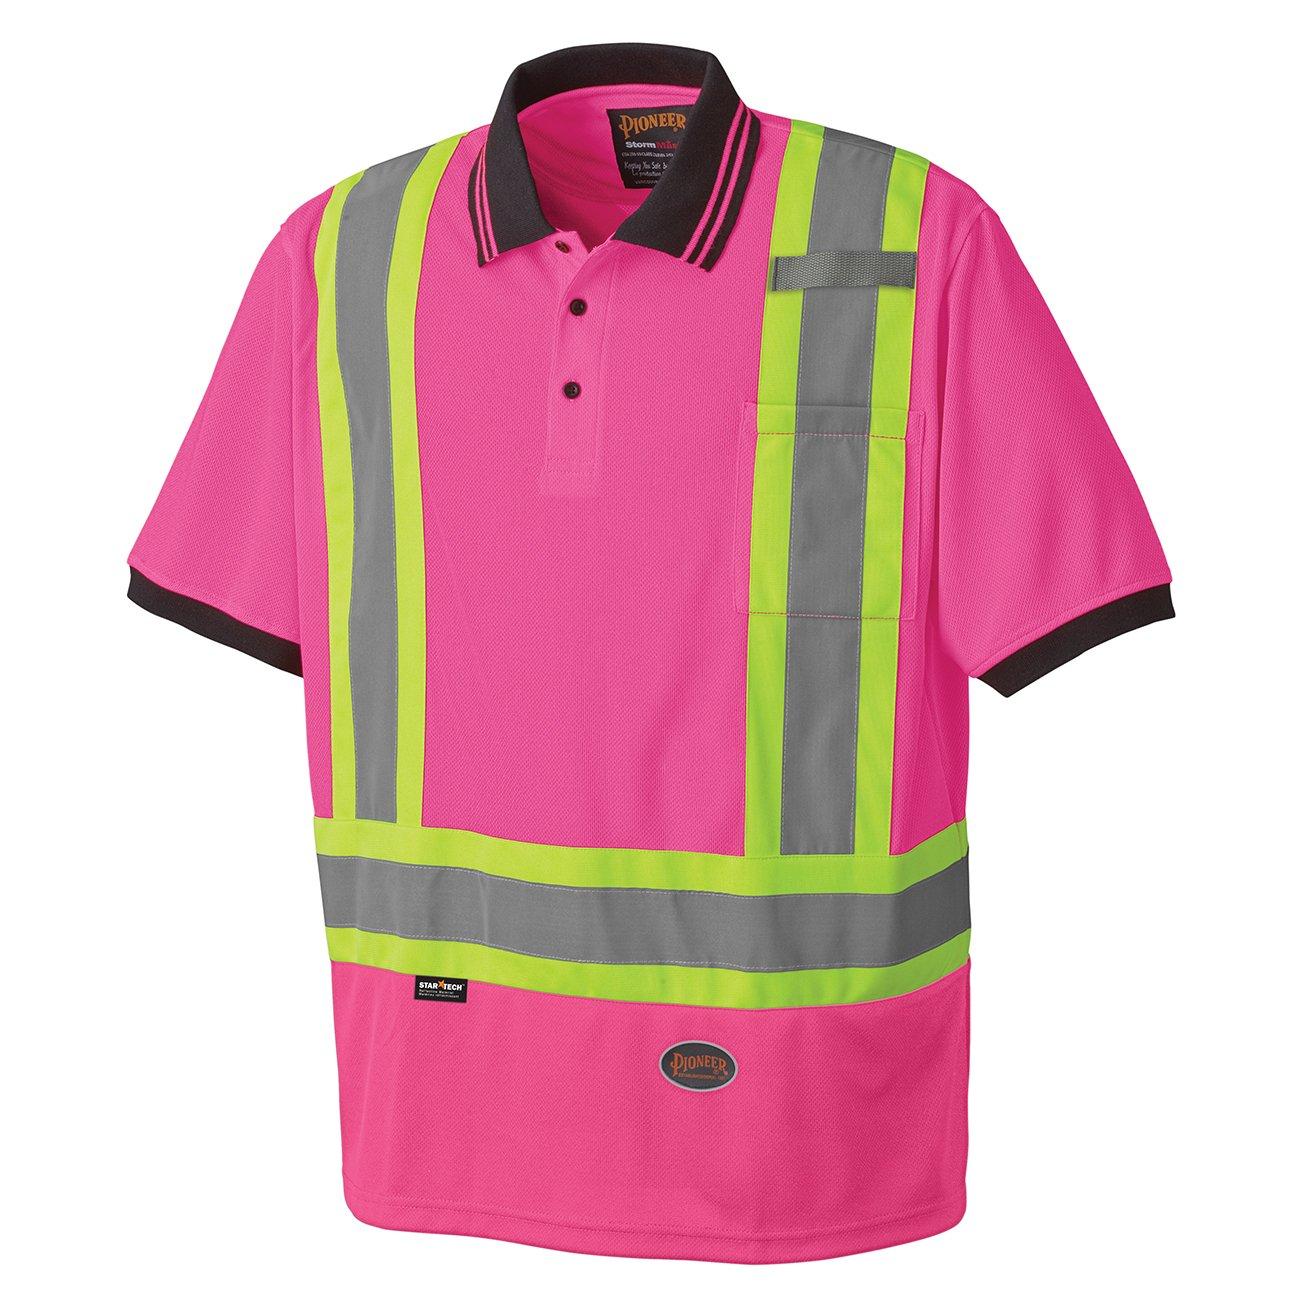 Pioneer Women's Birdseye Safety Shirt V1051510 - 6999